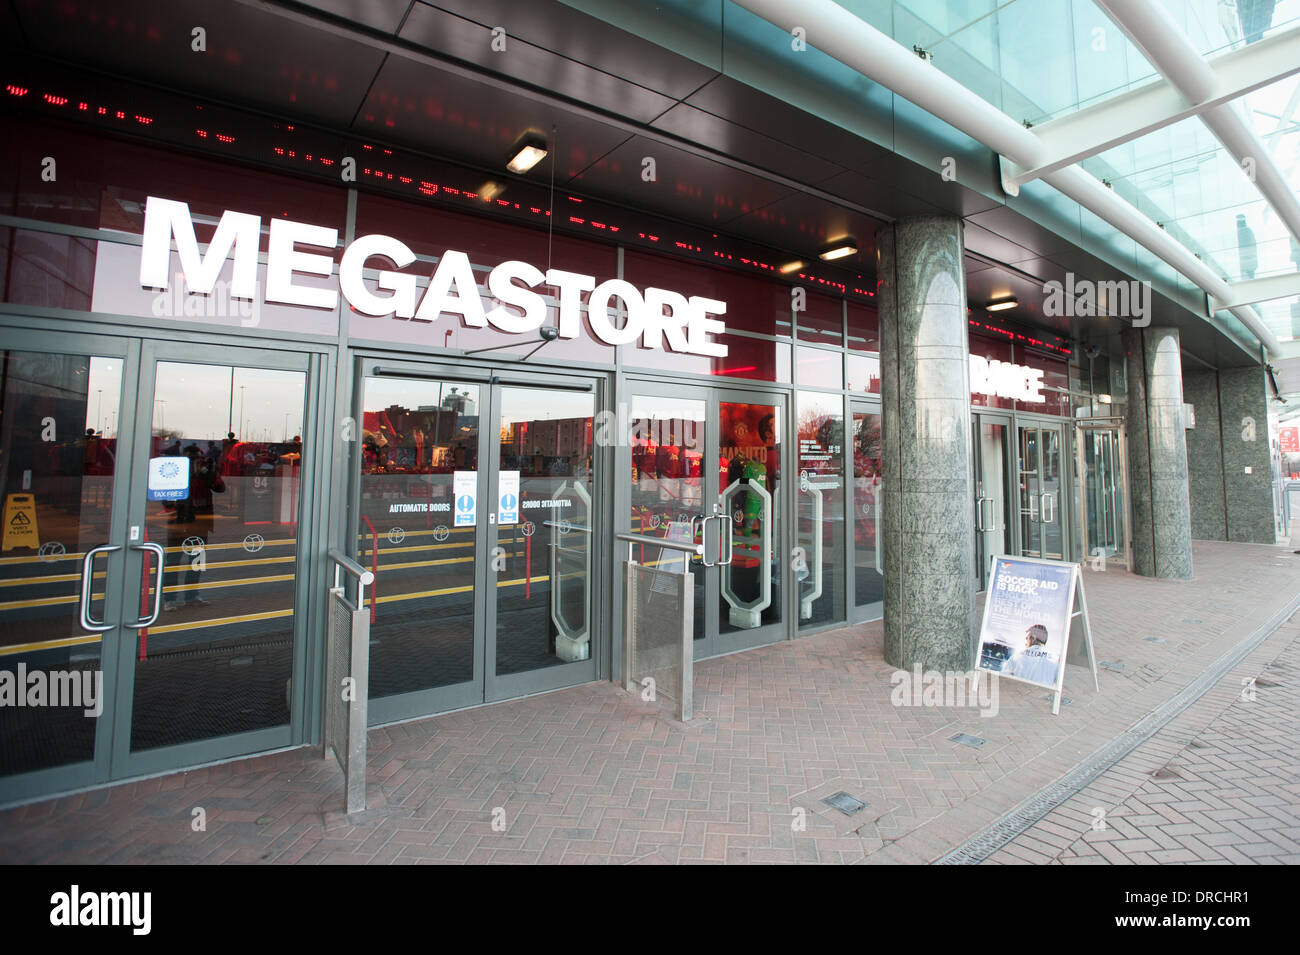 97118cca441 Megastore. Old Trafford. Manchester United Stock Photo  66045589 - Alamy